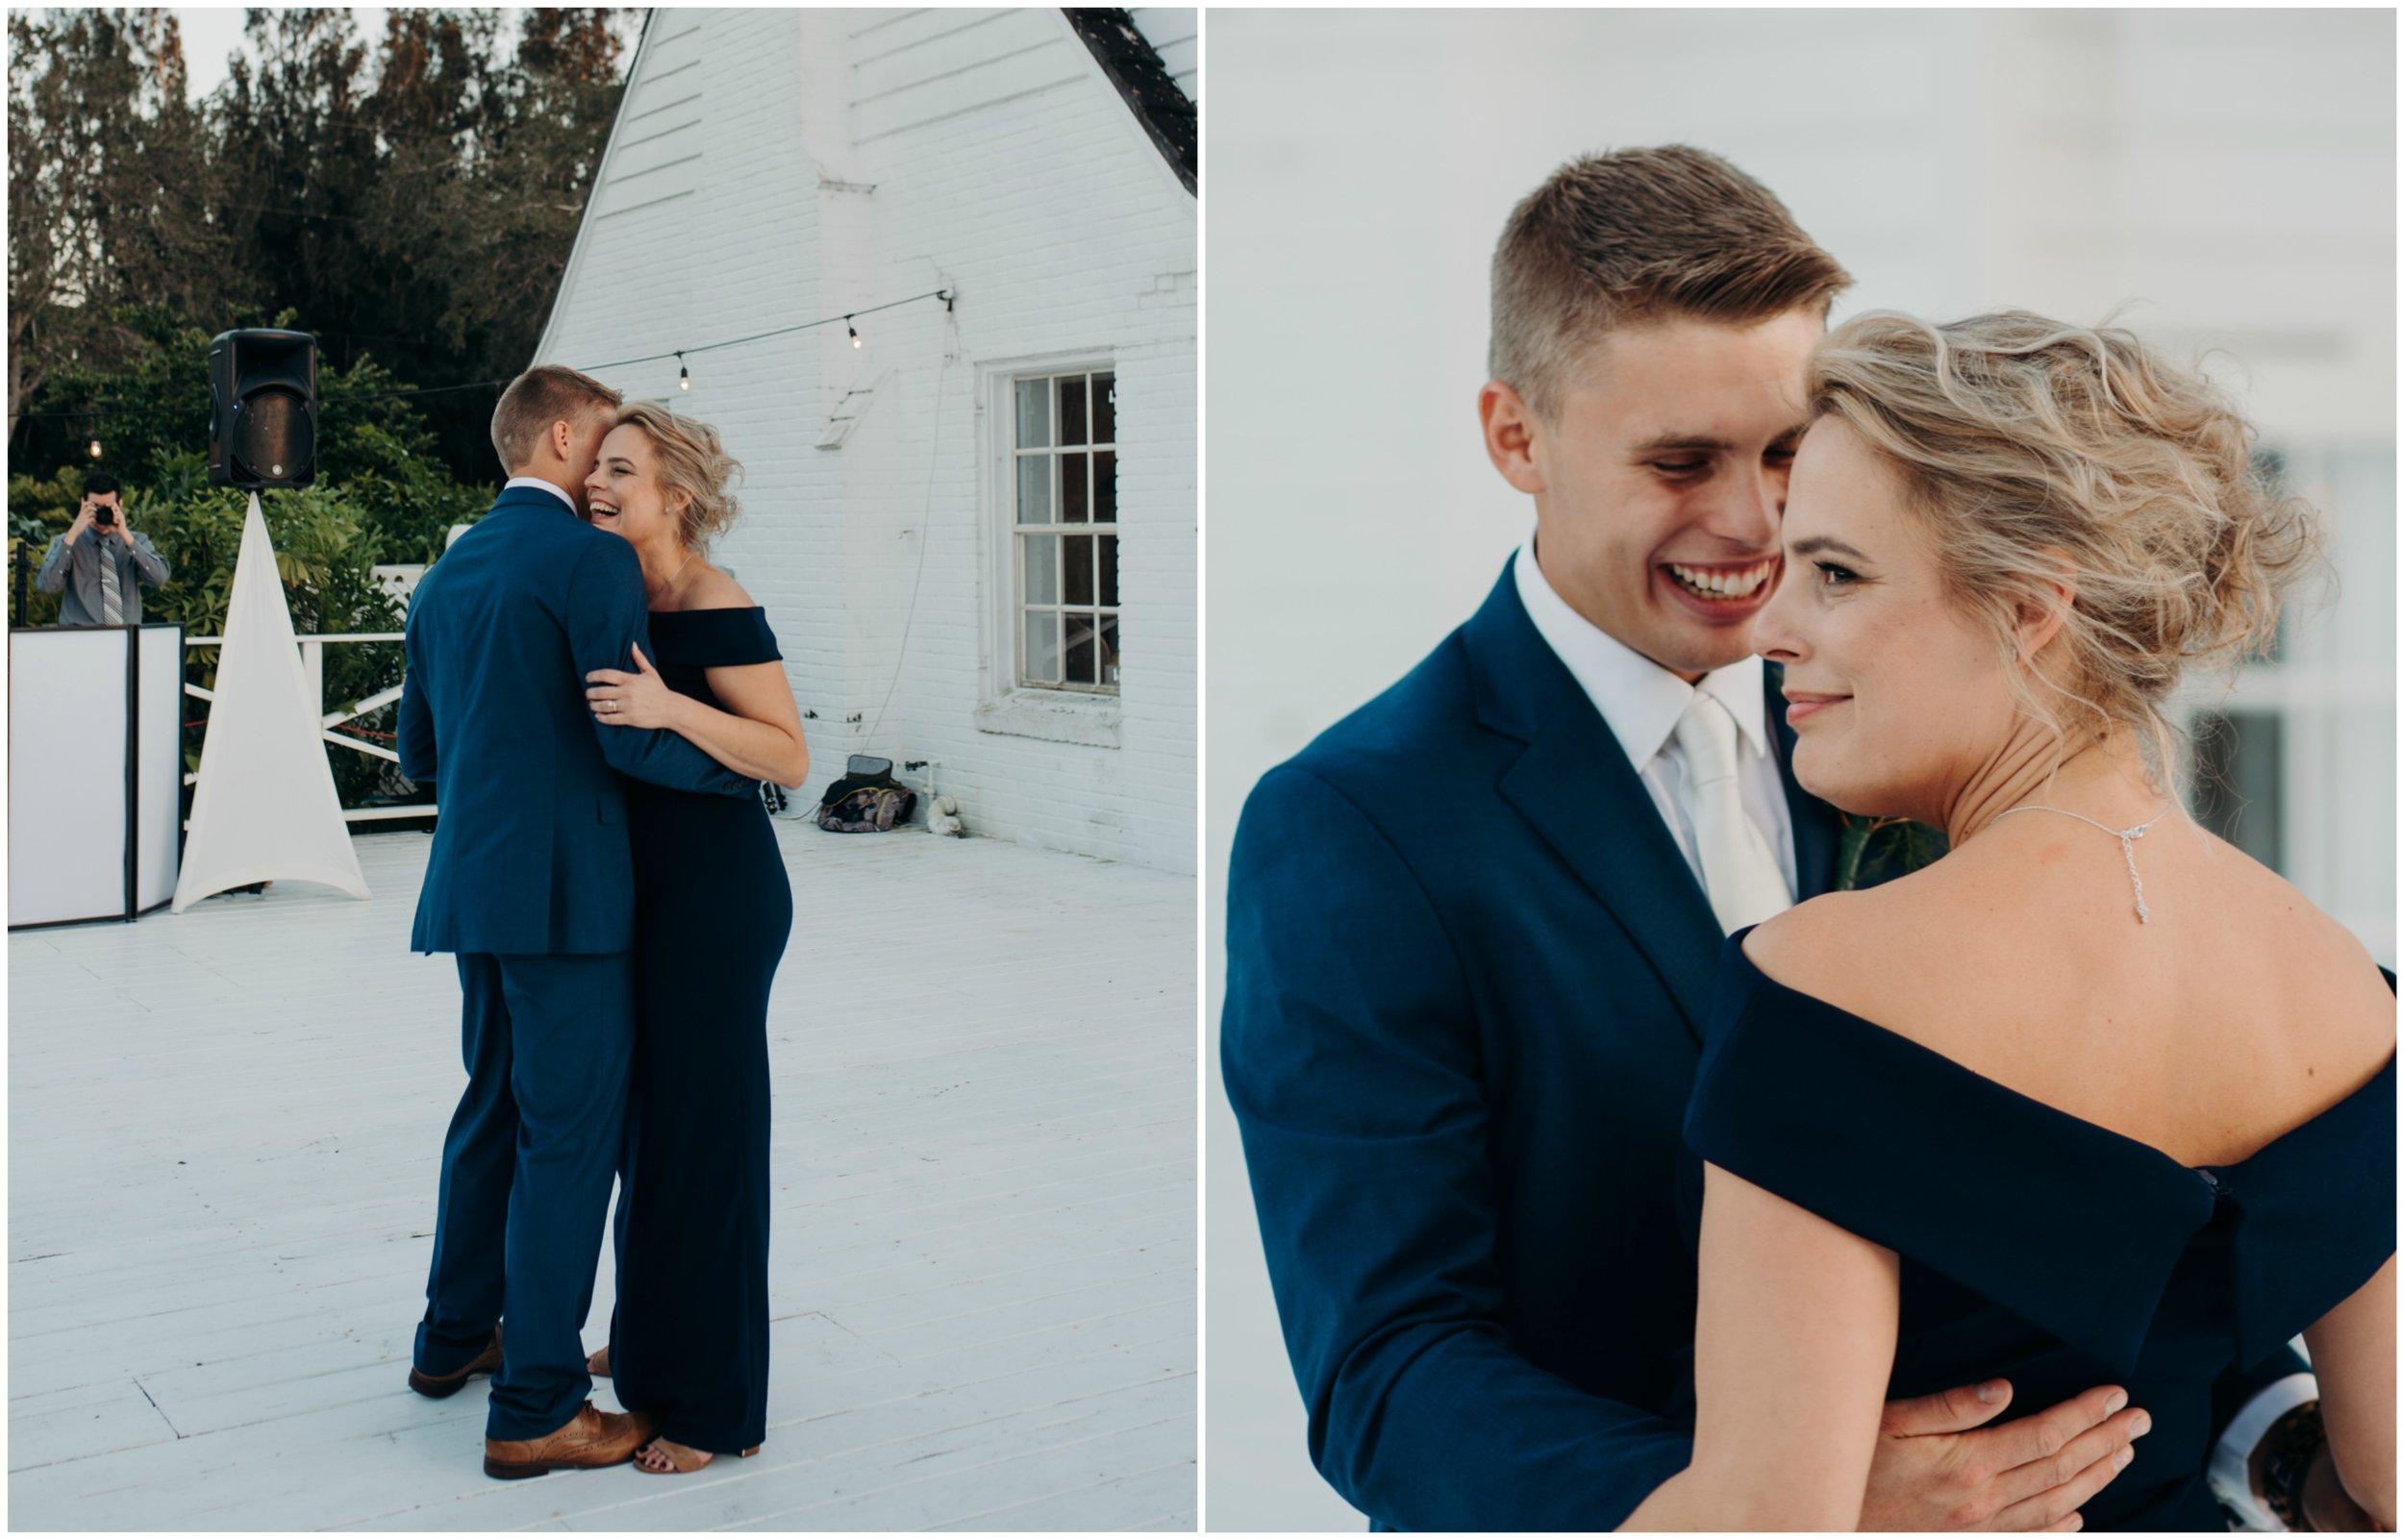 micayla-greyson-wedding-dancing-mother-son.jpg